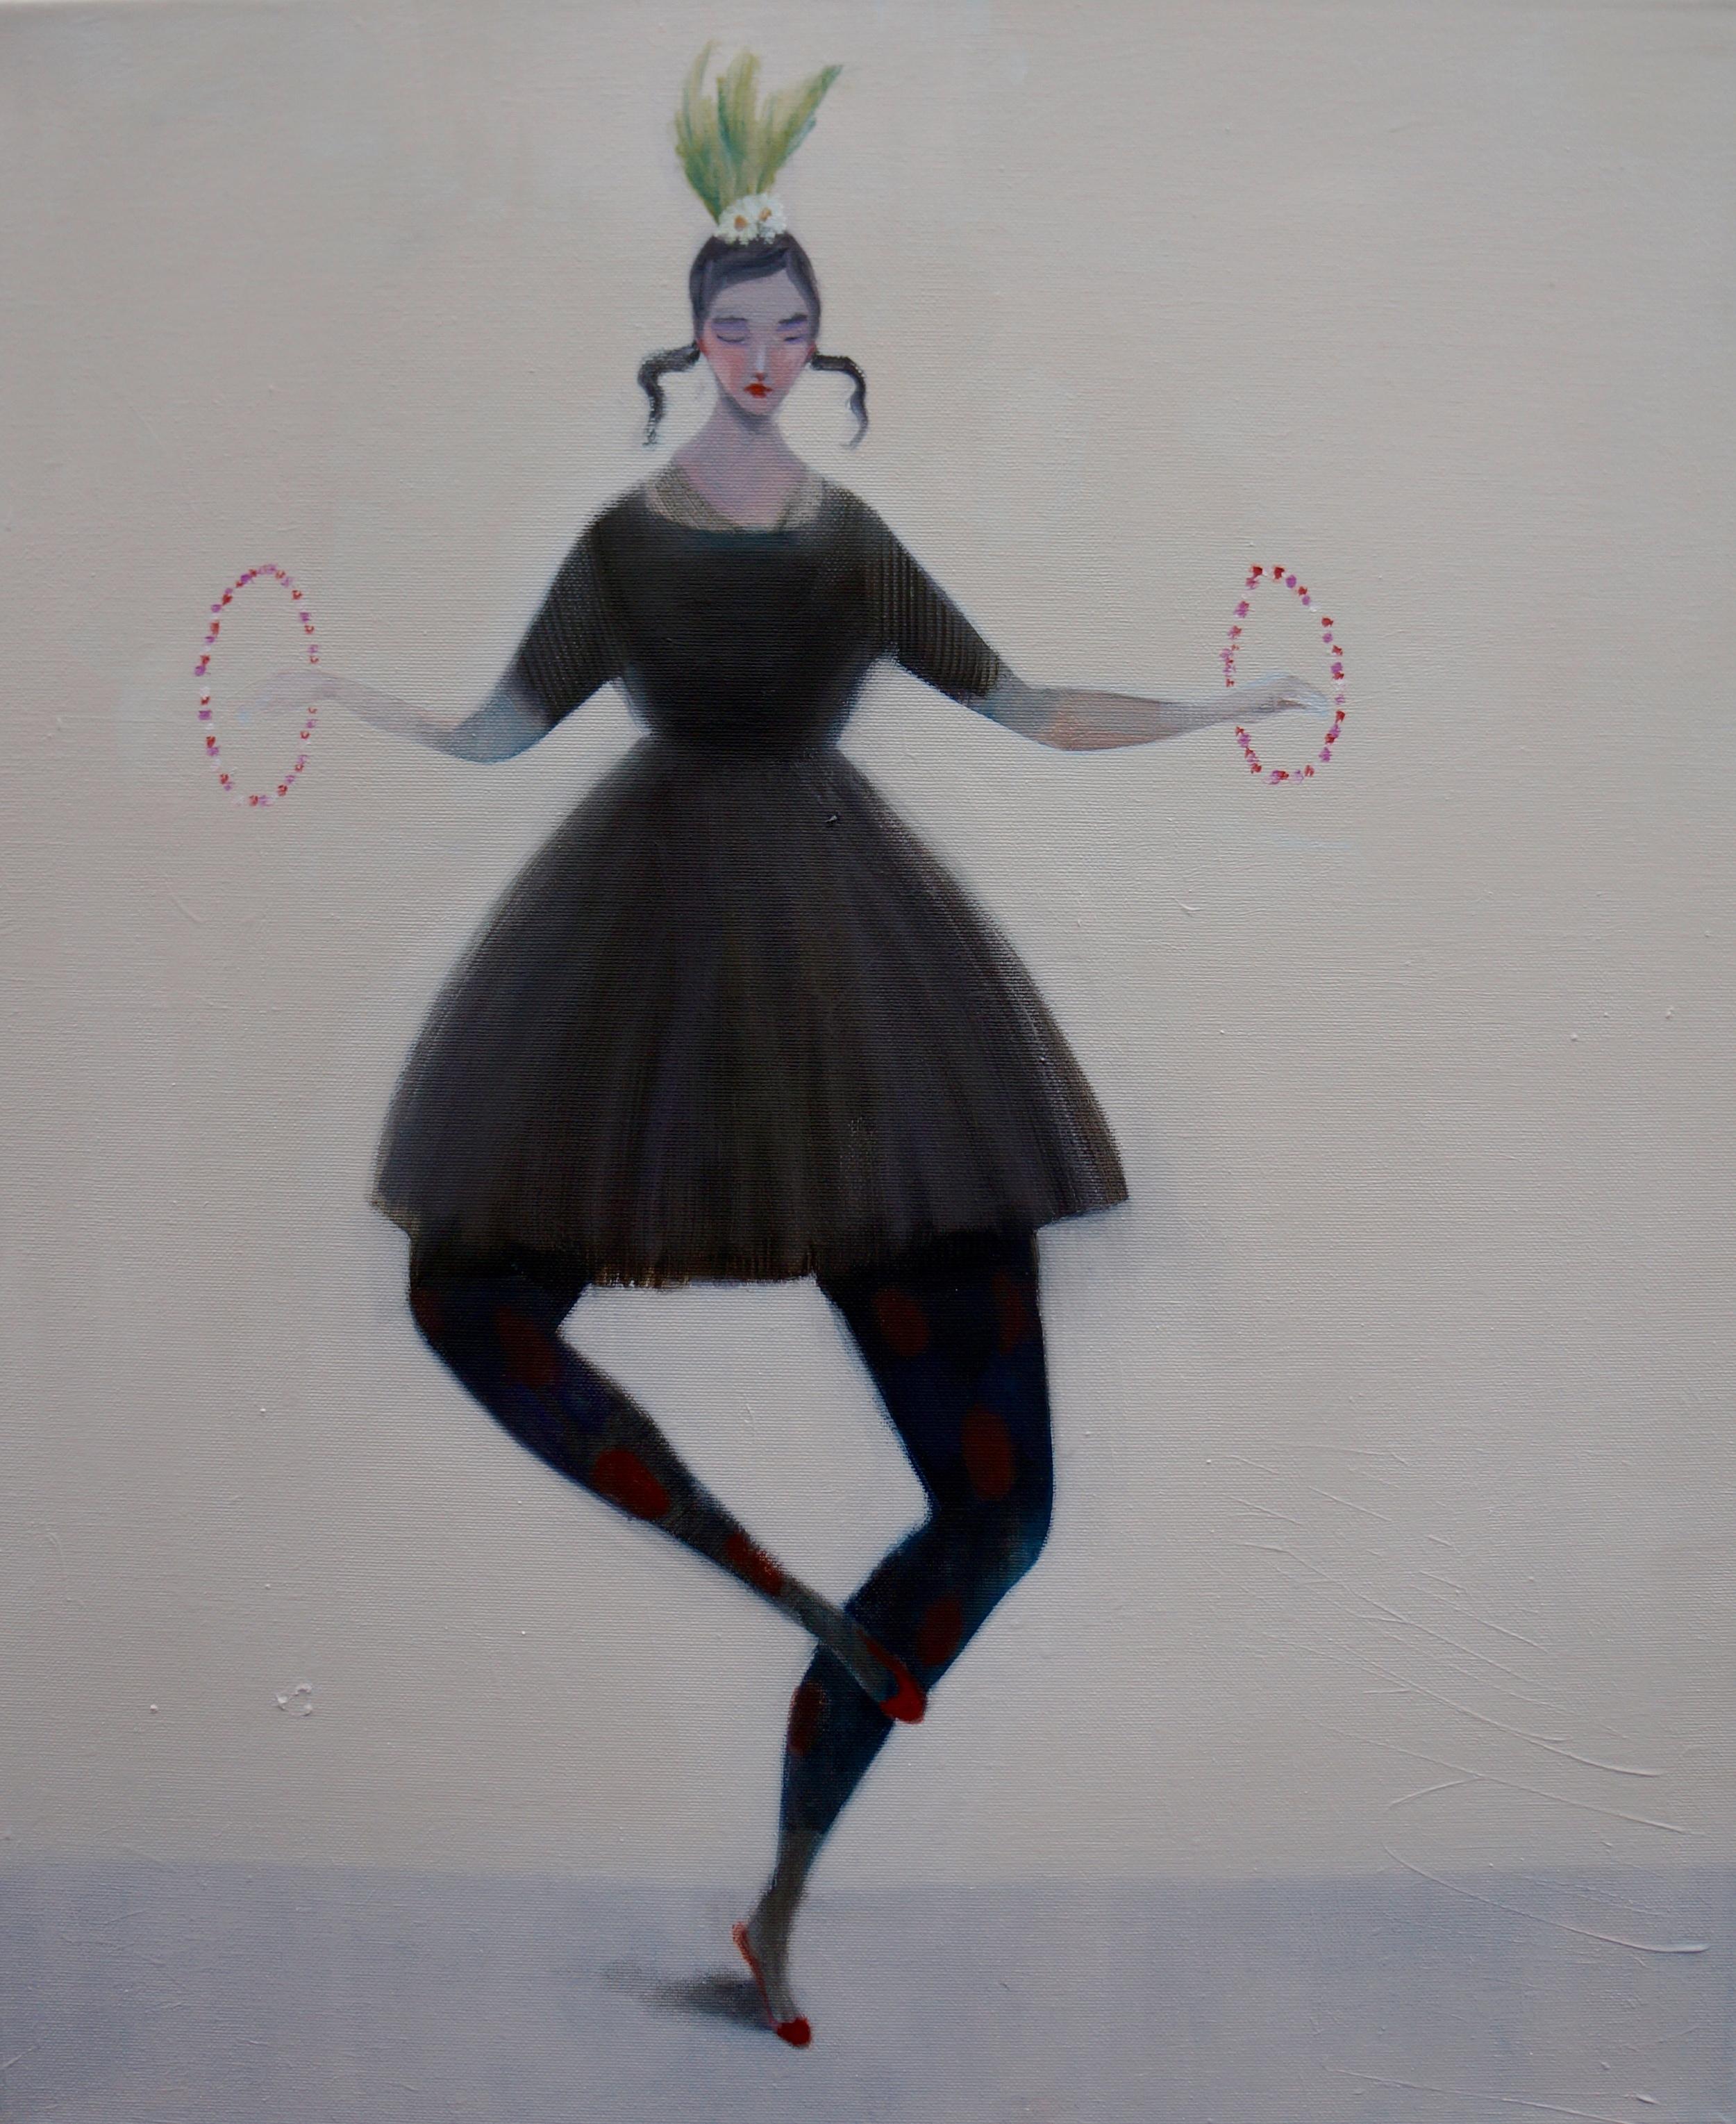 Kristin Vestgard Where will this lead oil on canvas 60 x 50 cm £ 2650